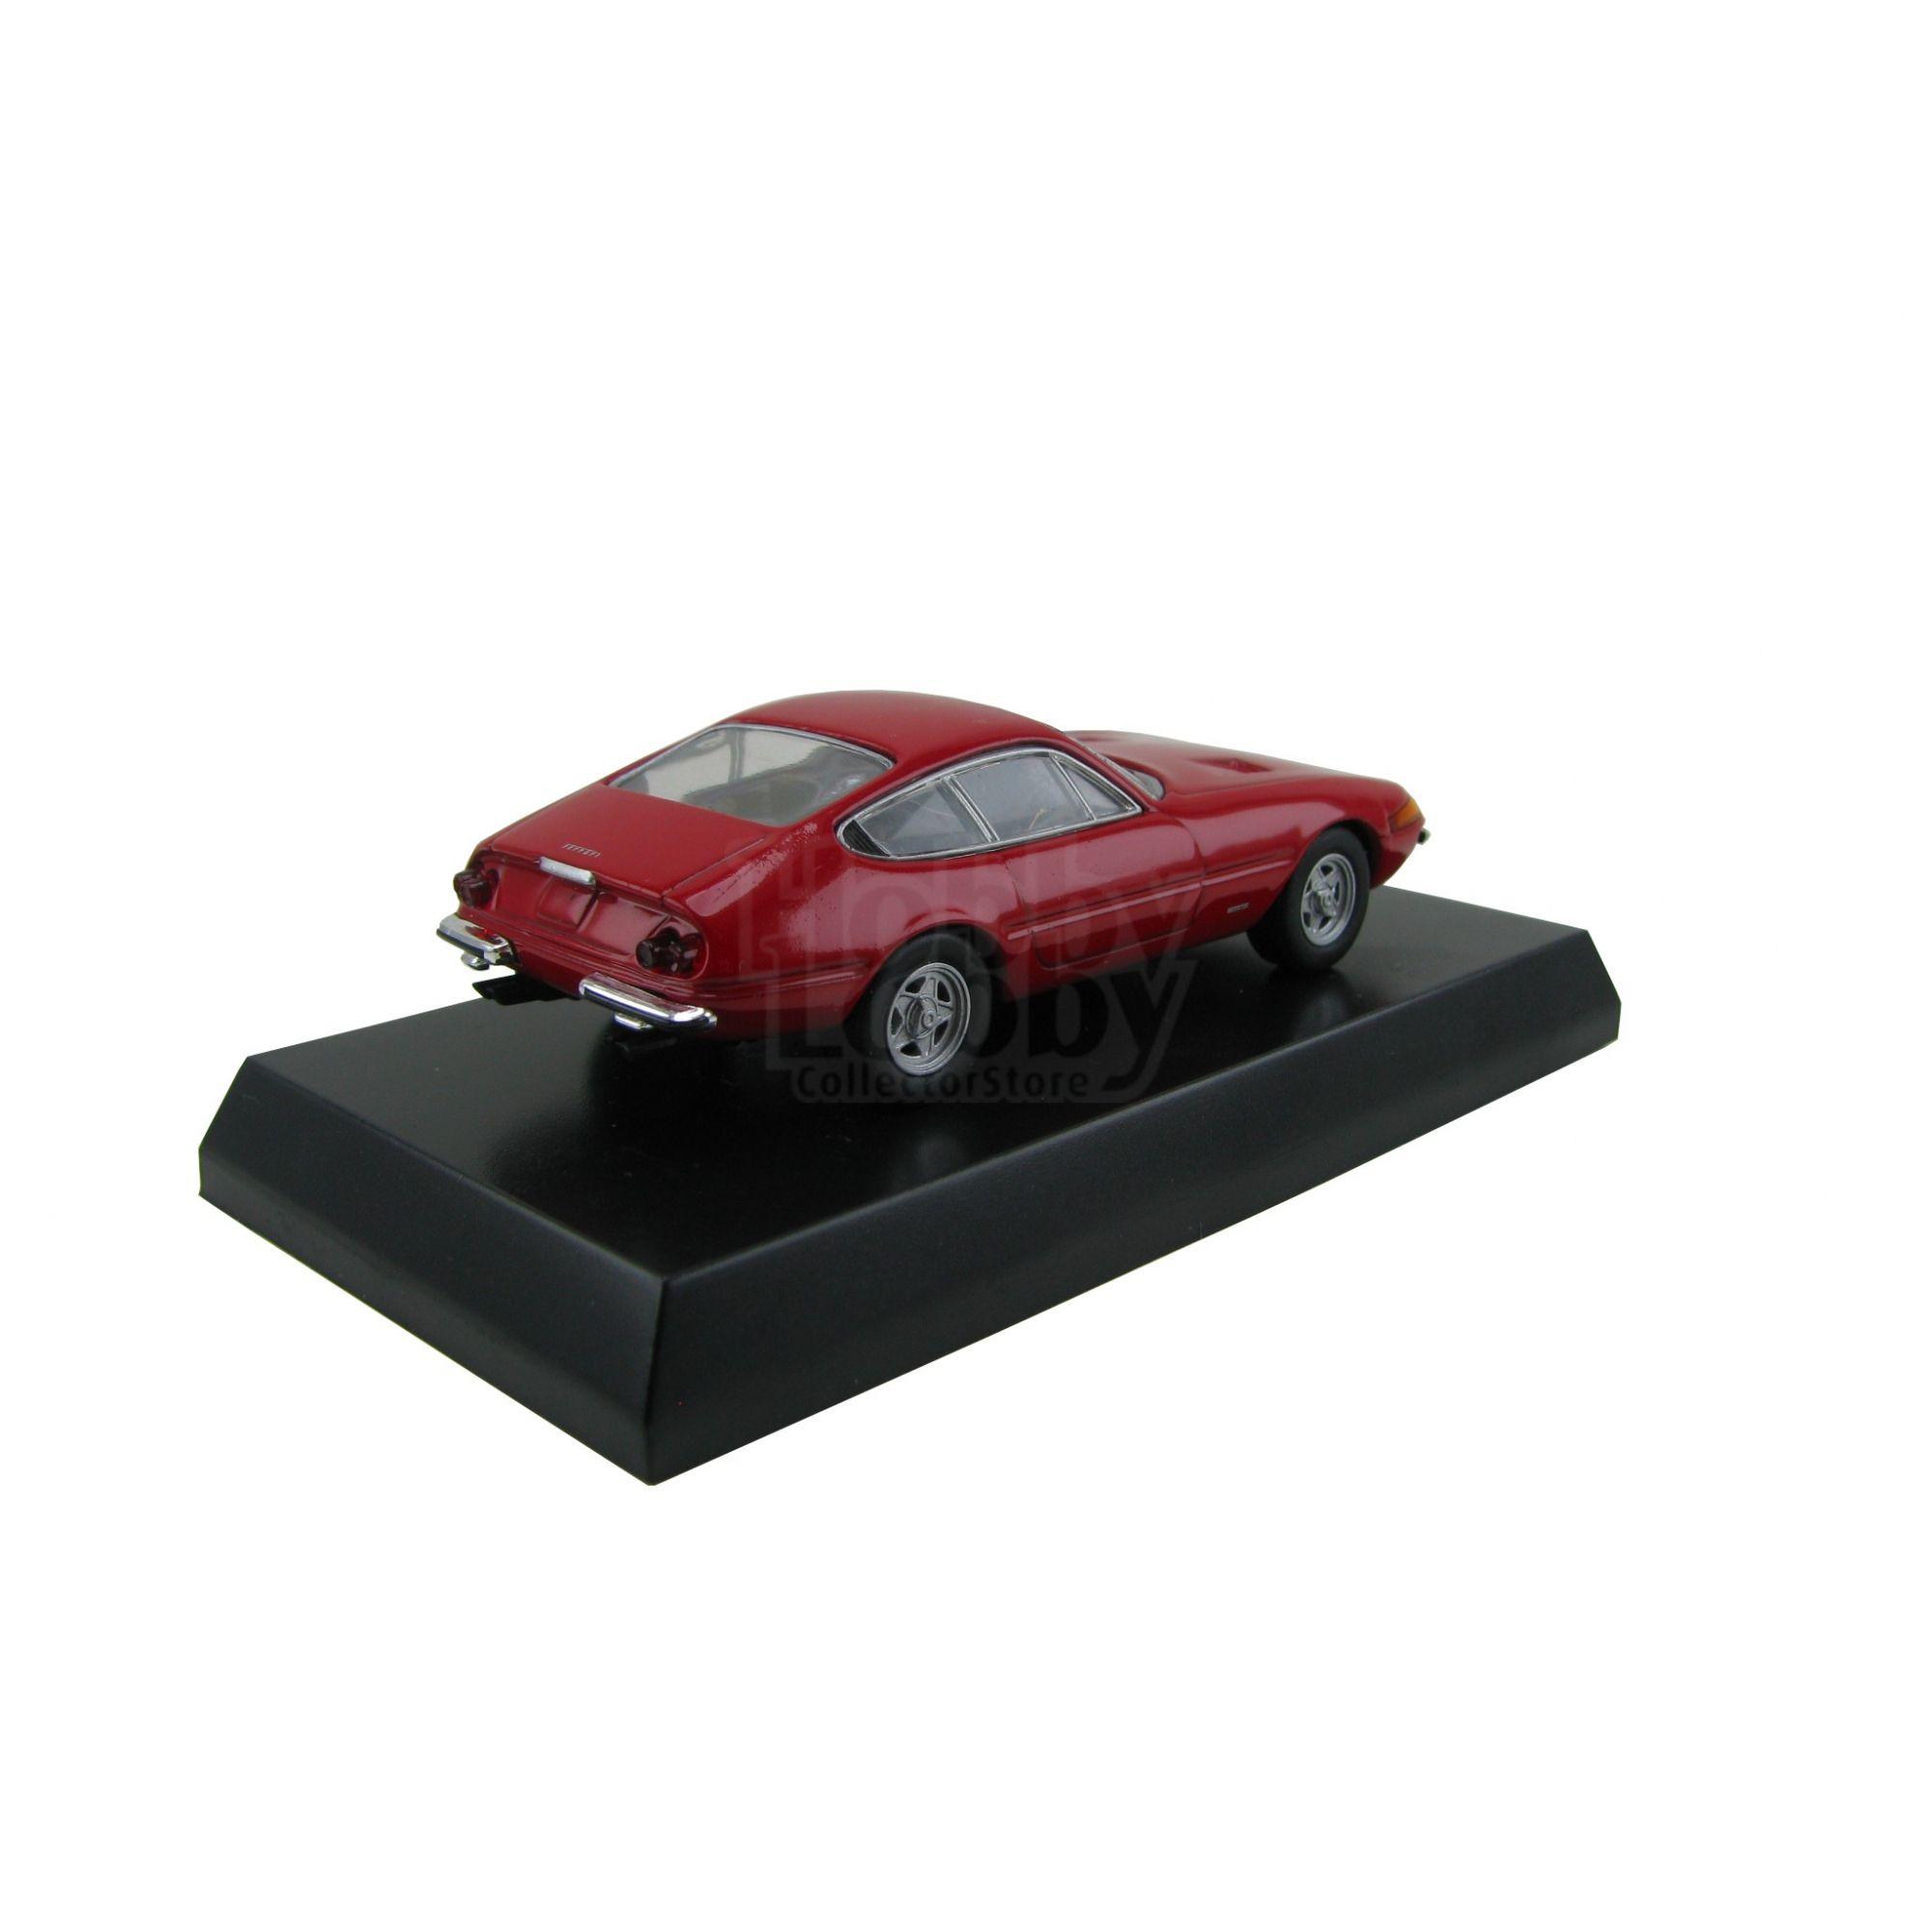 Kyosho - Ferrari Minicar Collection III - Ferrari 365 GTB4 (Daytona) [vermelha]  - Hobby Lobby CollectorStore